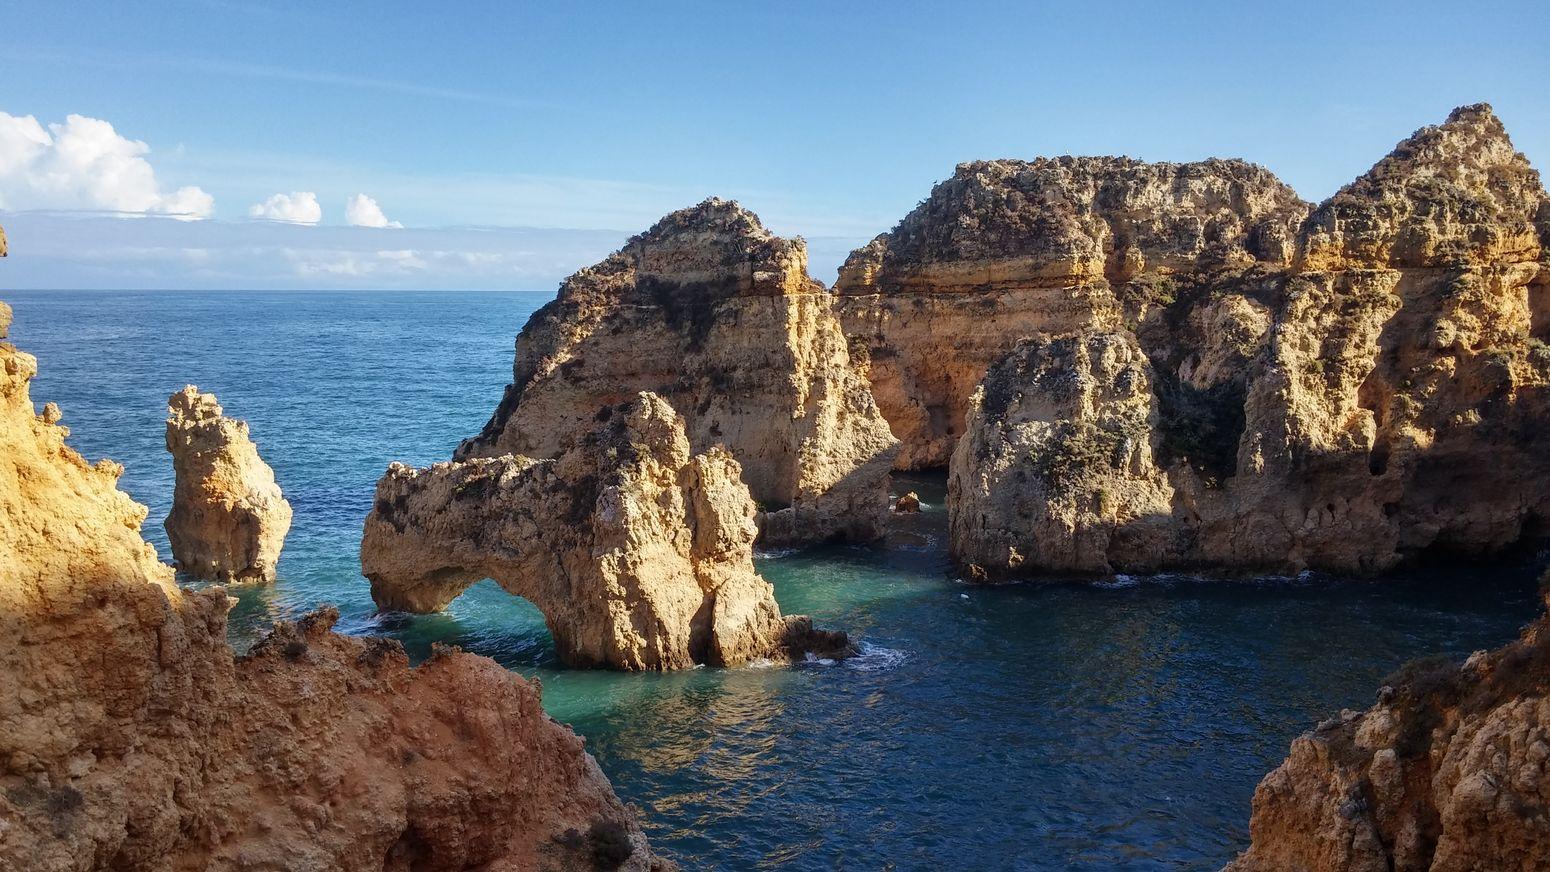 Ponta da piedade Sunbathing Relaxing Sea